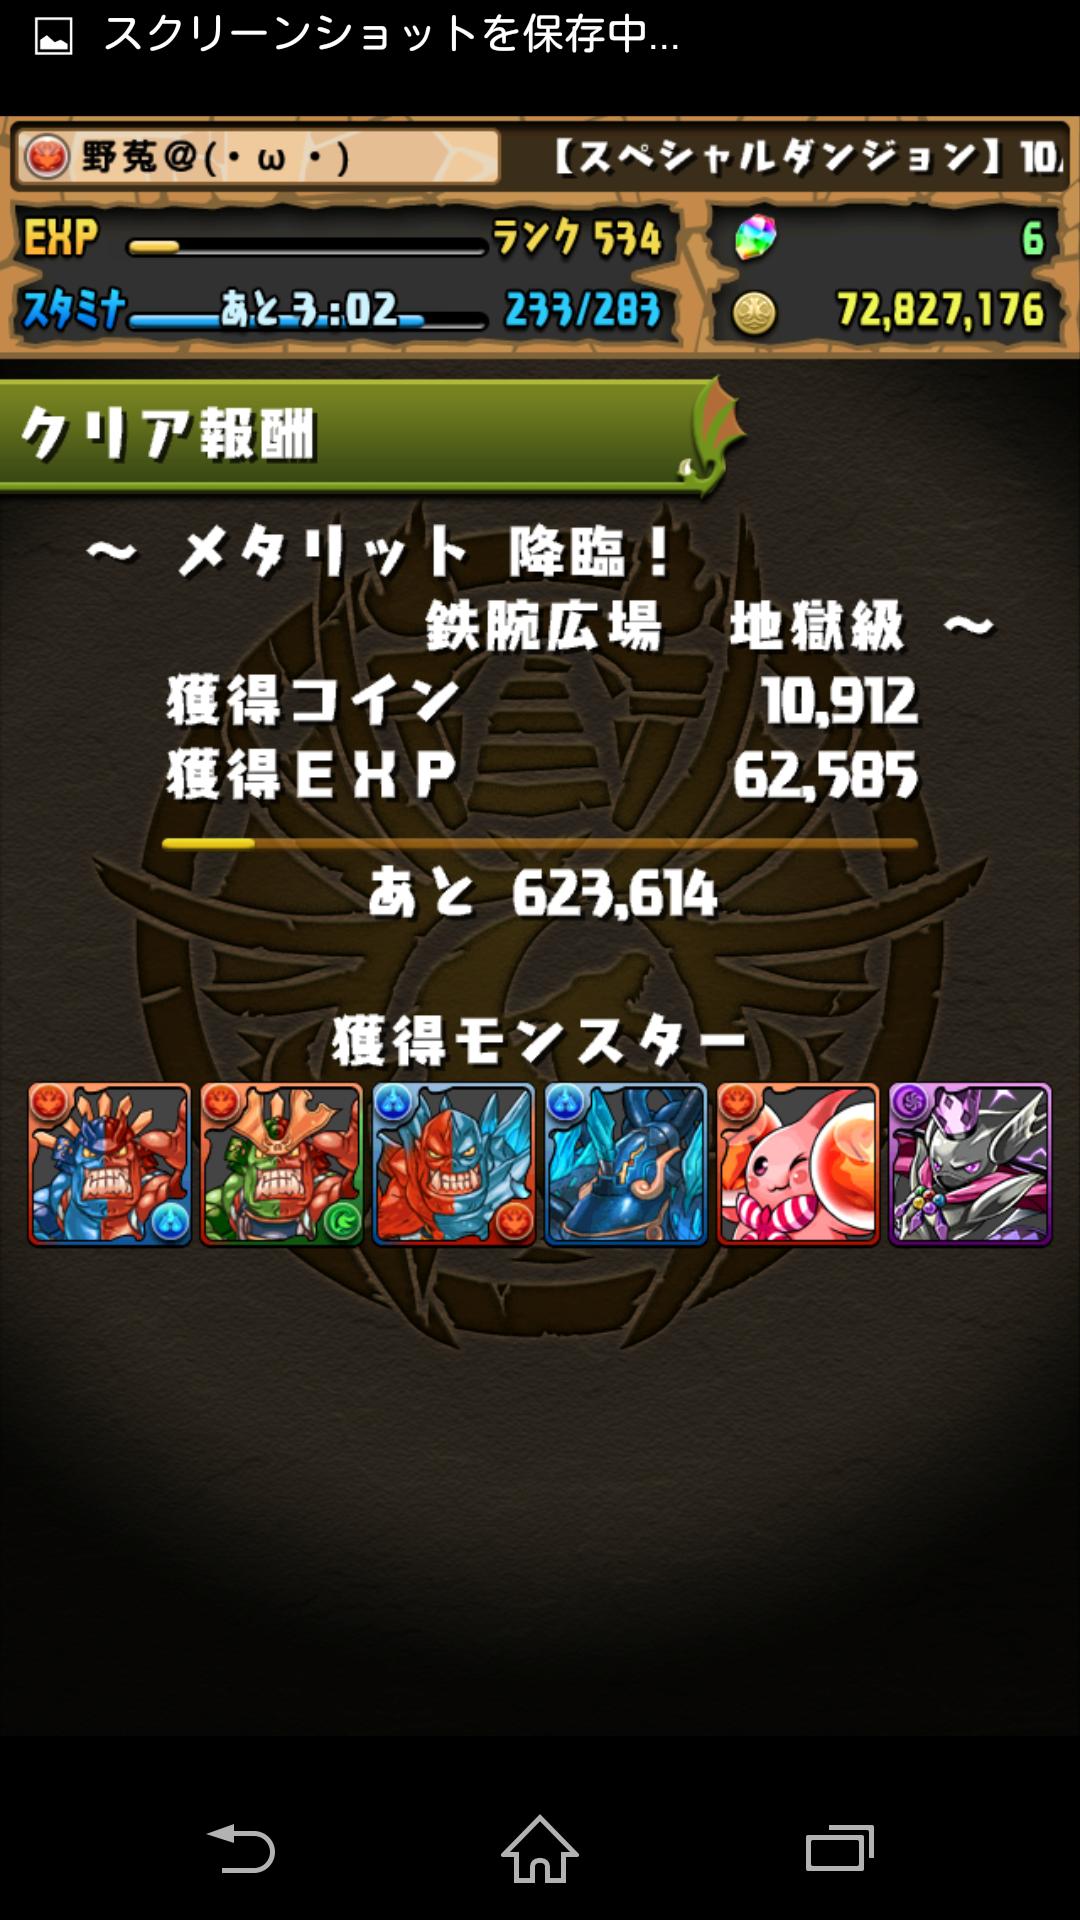 Screenshot_2015-10-29-23-11-03.png